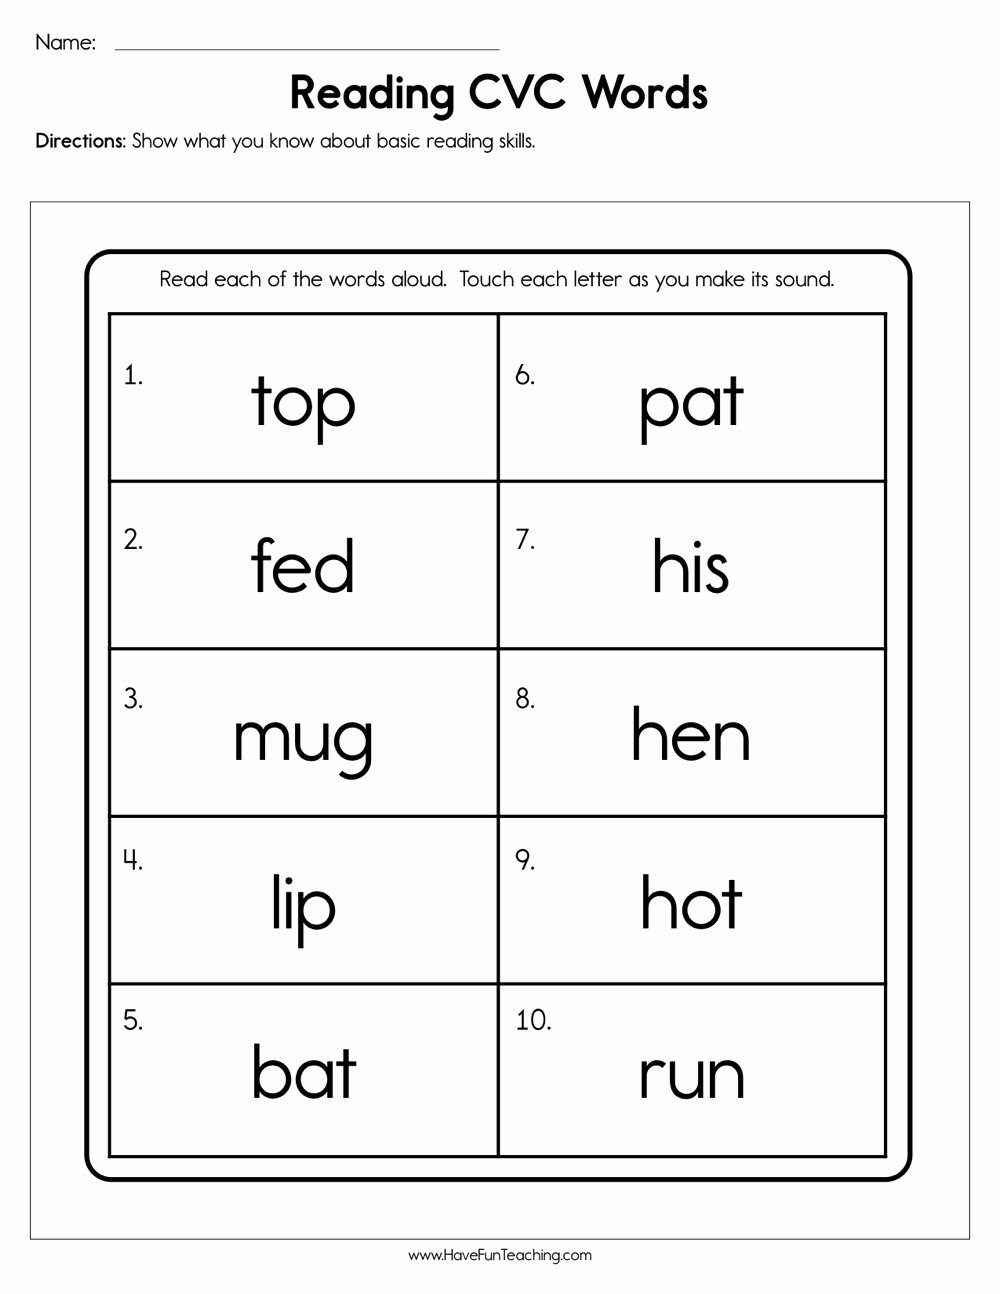 Cvc Worksheets for First Grade Printable Reading Cvc Words Worksheet